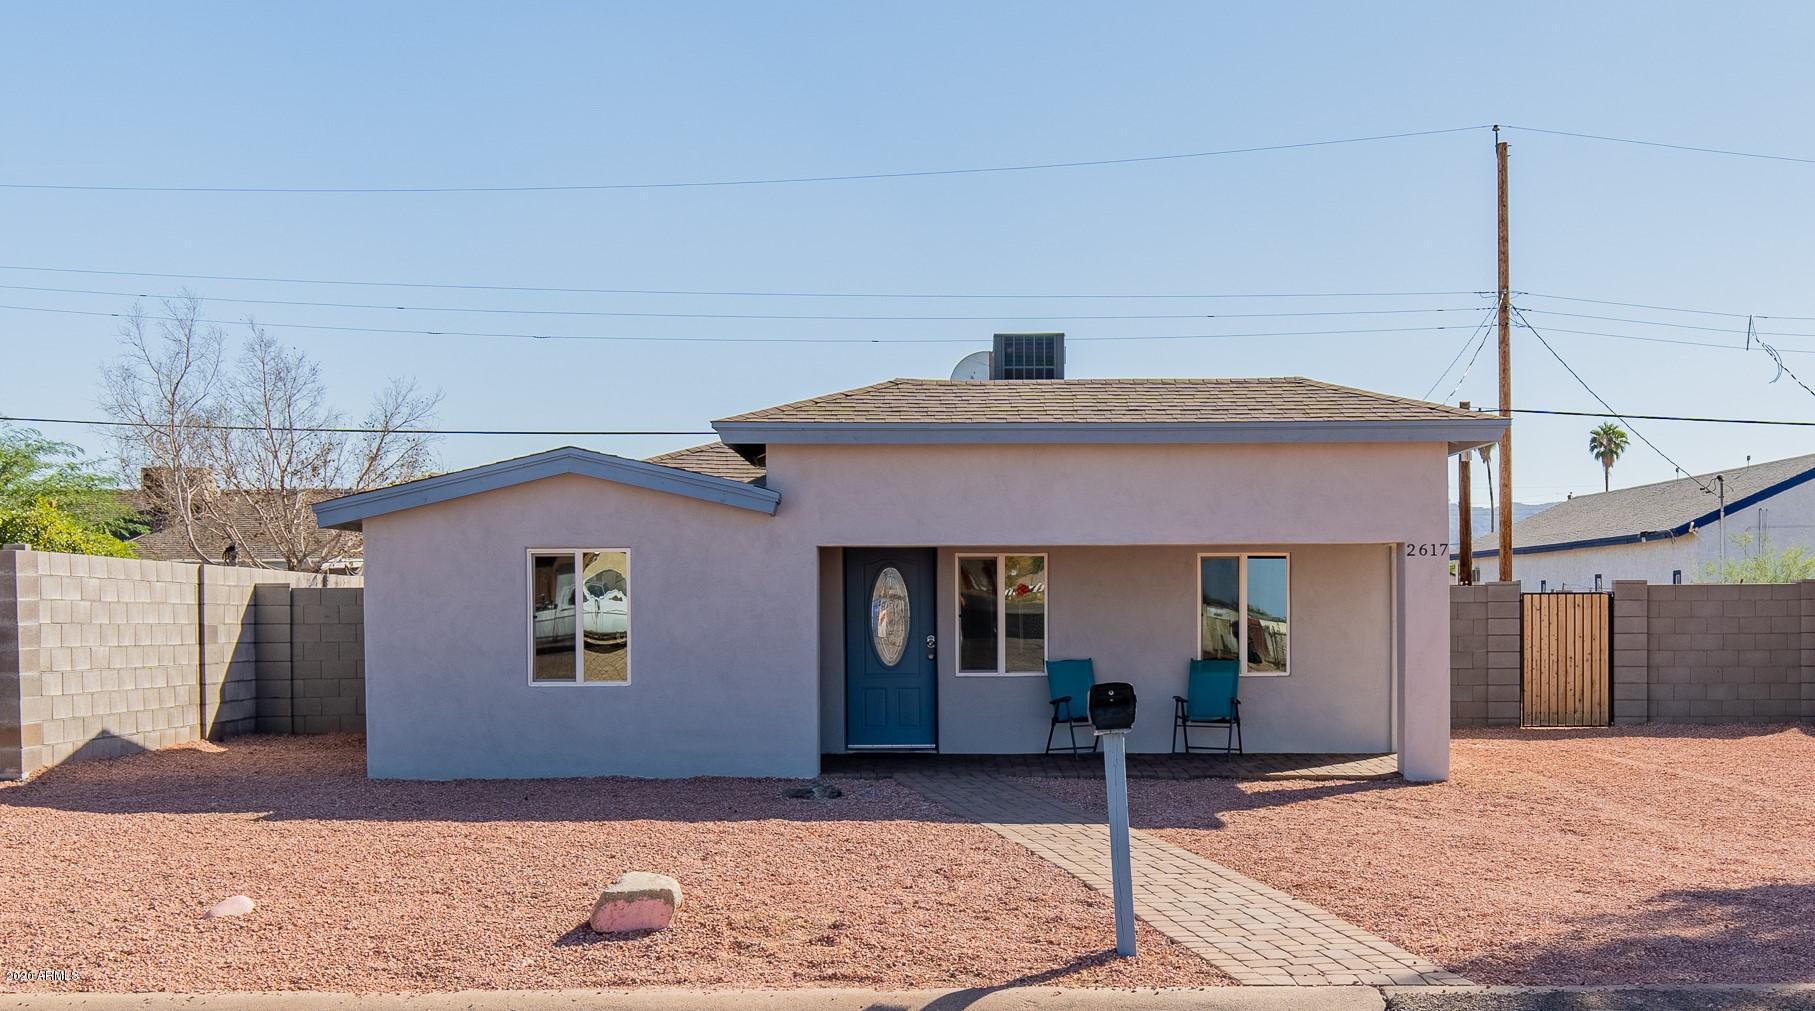 2617 Illini Street, Phoenix, Arizona 85040, 3 Bedrooms Bedrooms, ,2 BathroomsBathrooms,Residential,For Sale,Illini,6153257